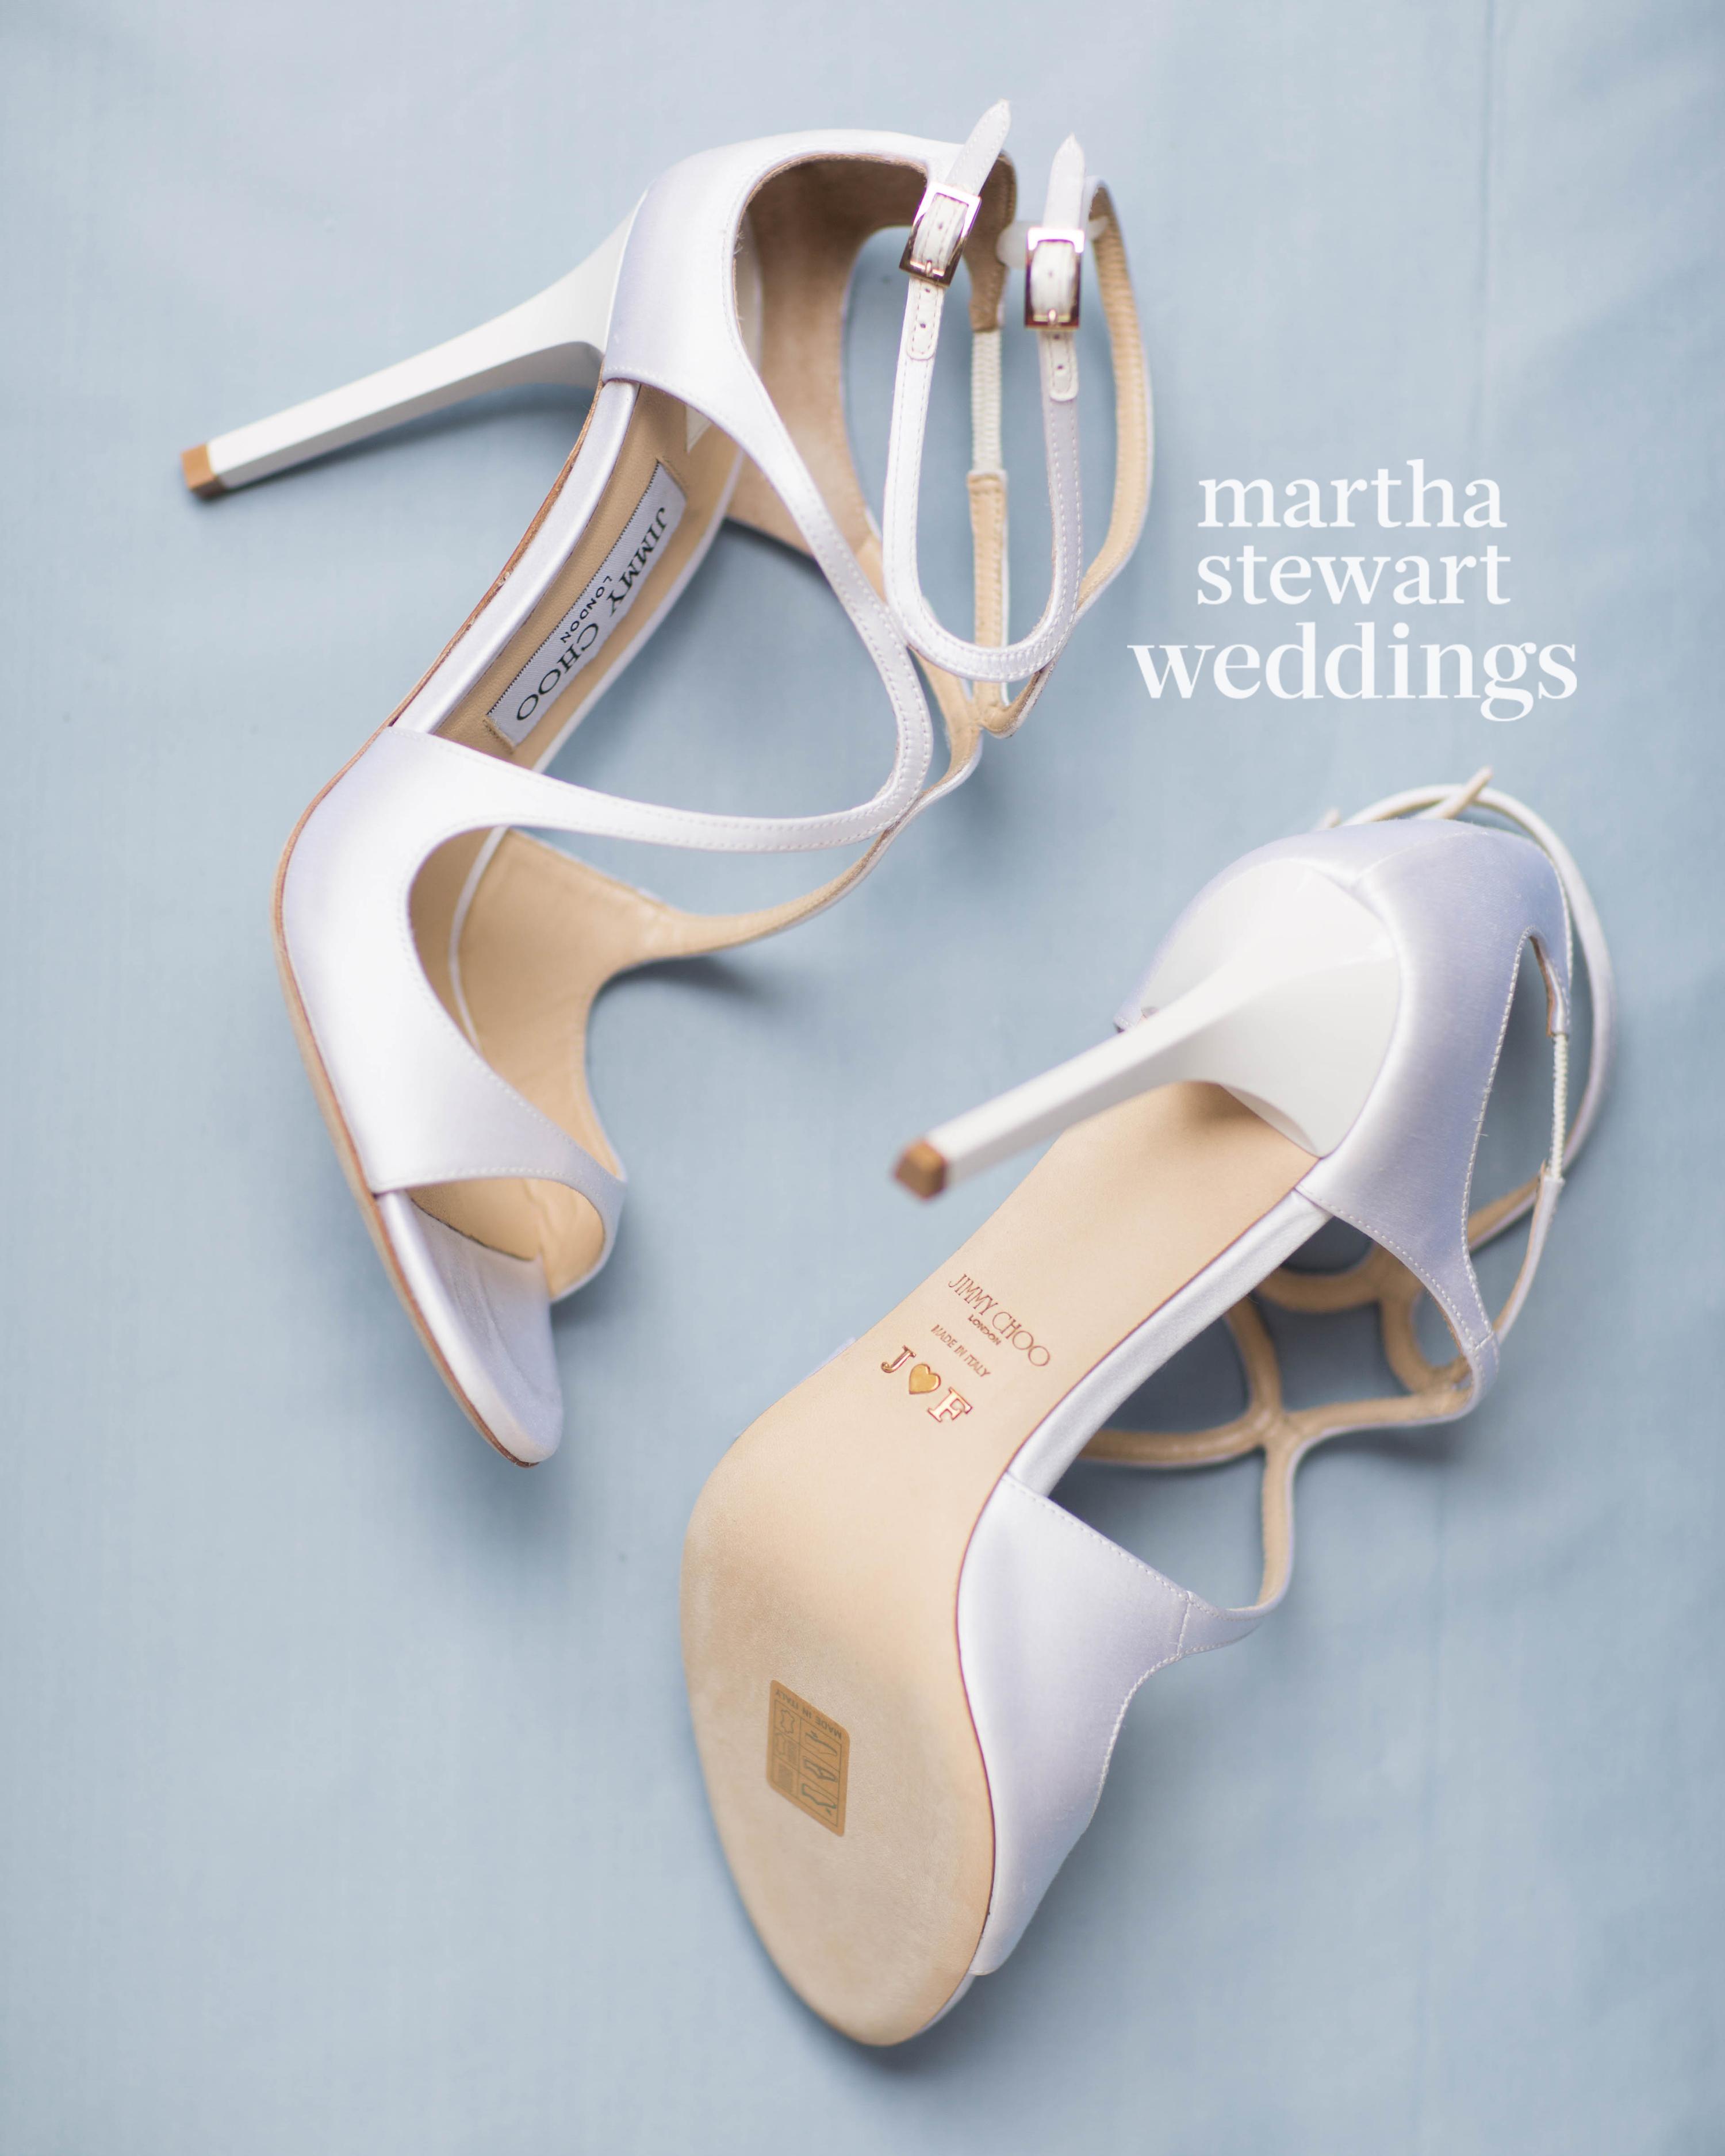 jenny-freddie-wedding-france-024-d112242-watermarked-1215.jpg